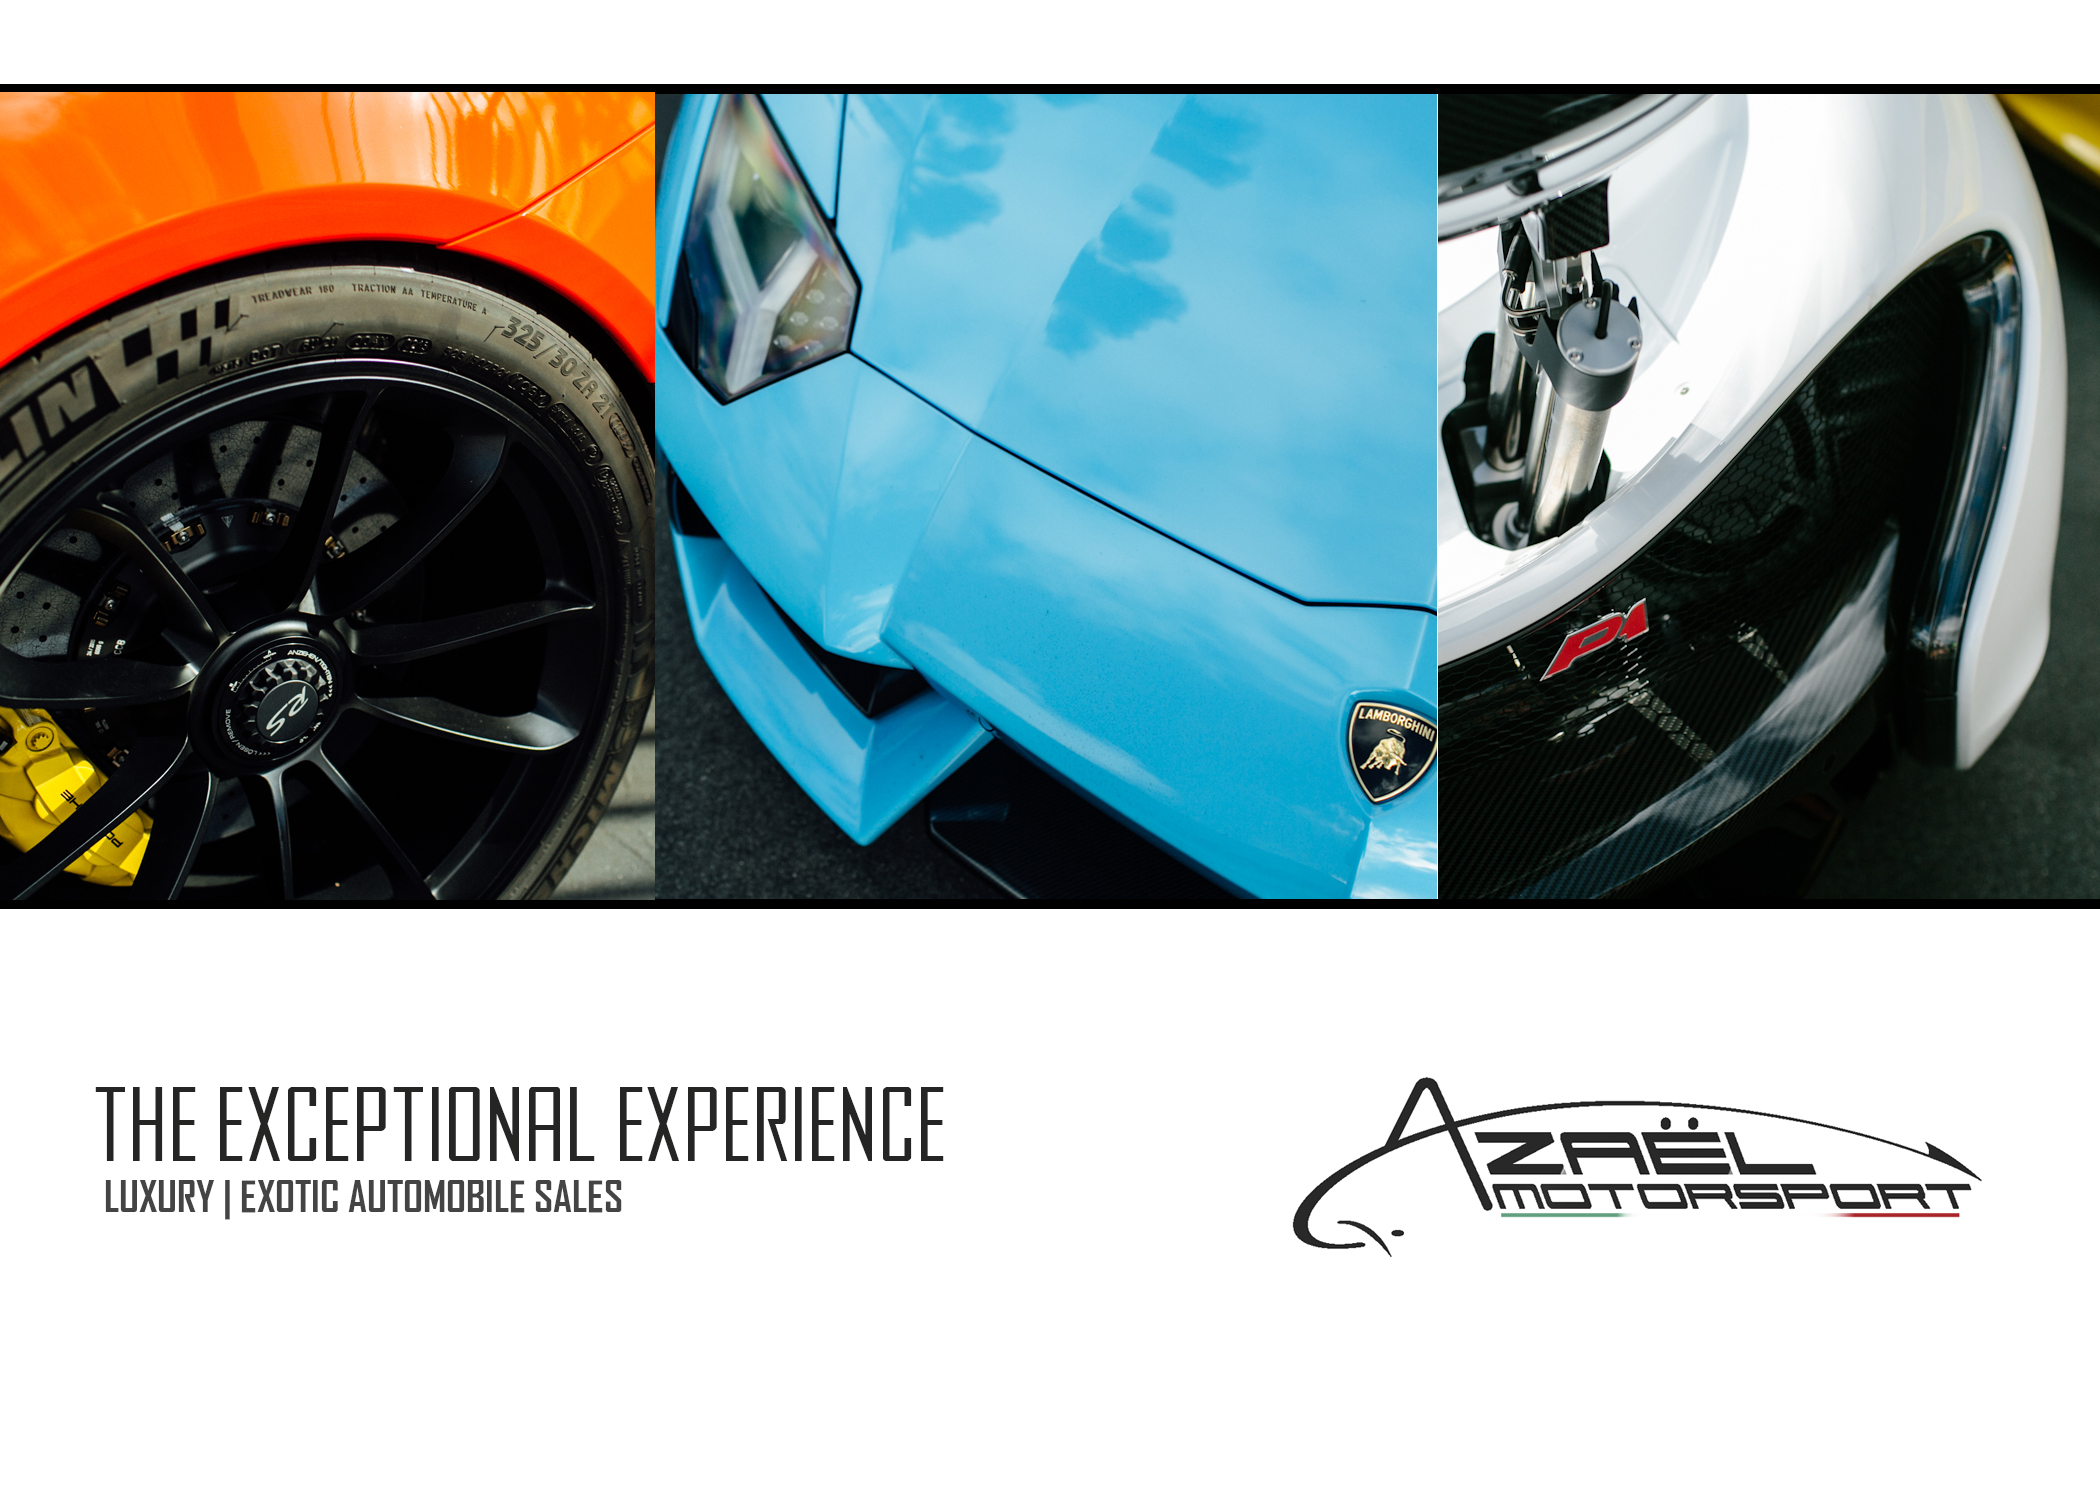 azael motorsport- company logo